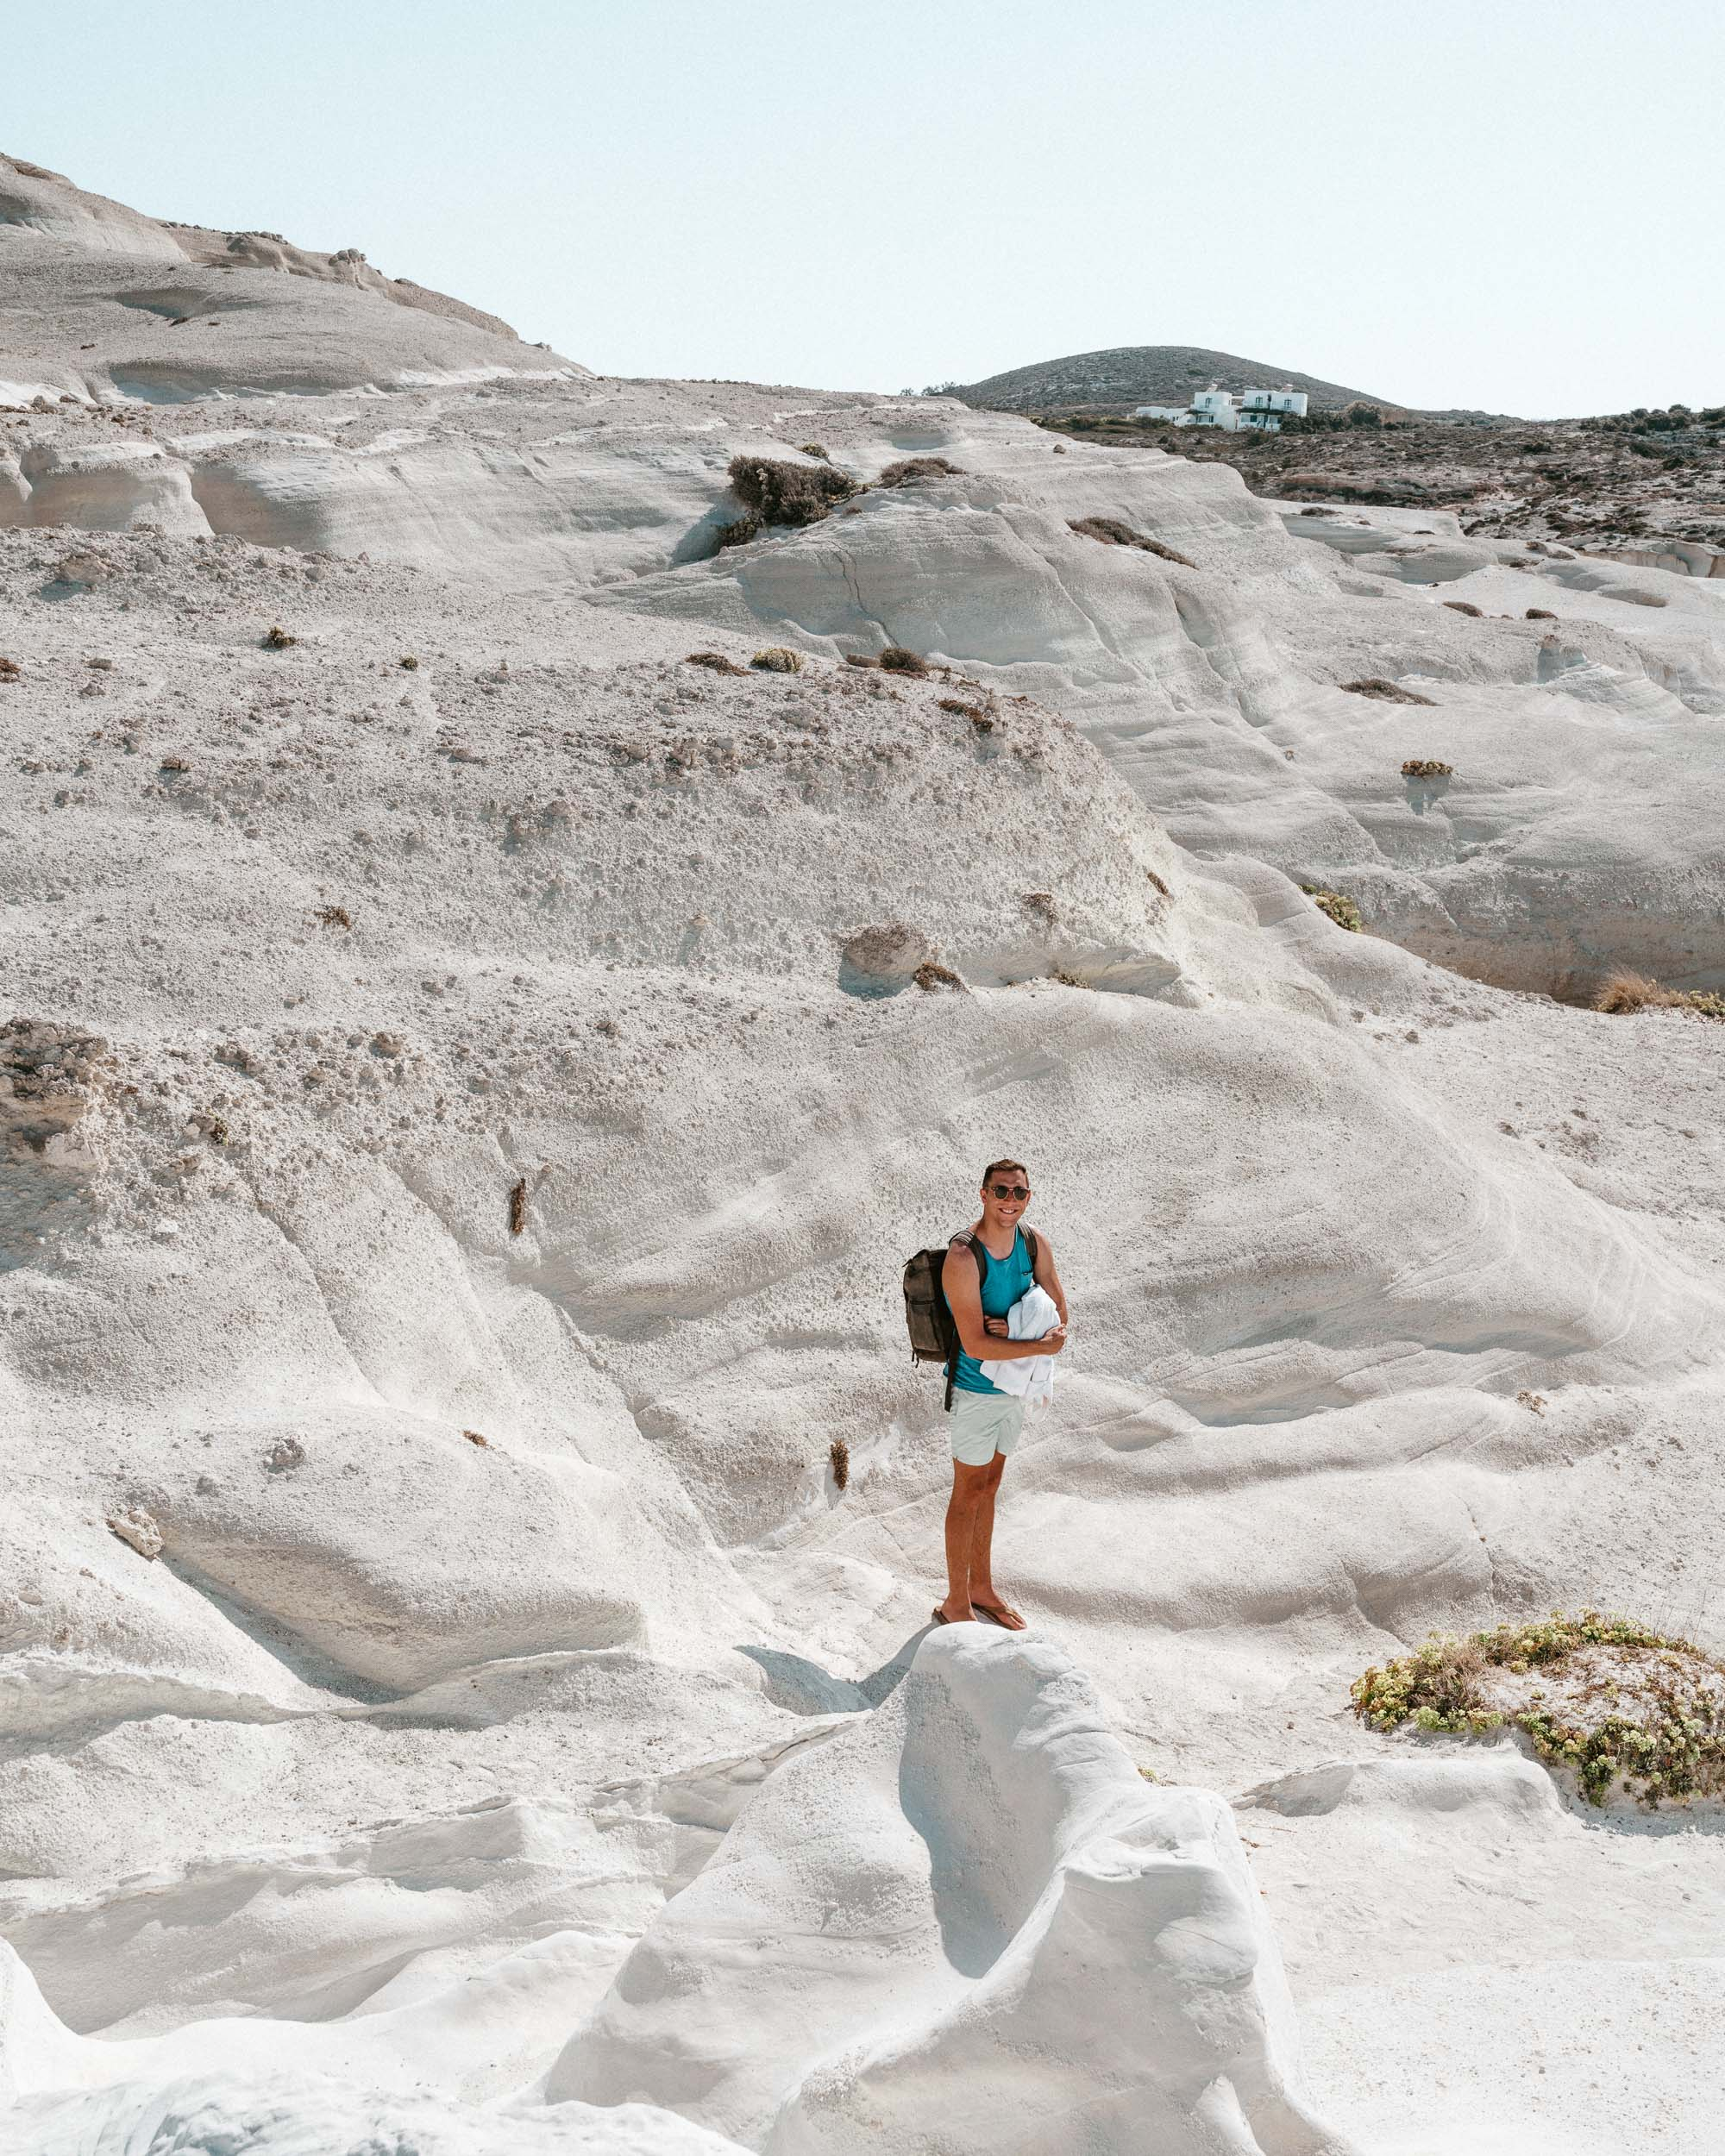 Sarakiniko white beach in Milos, Greek Islands via @finduslost